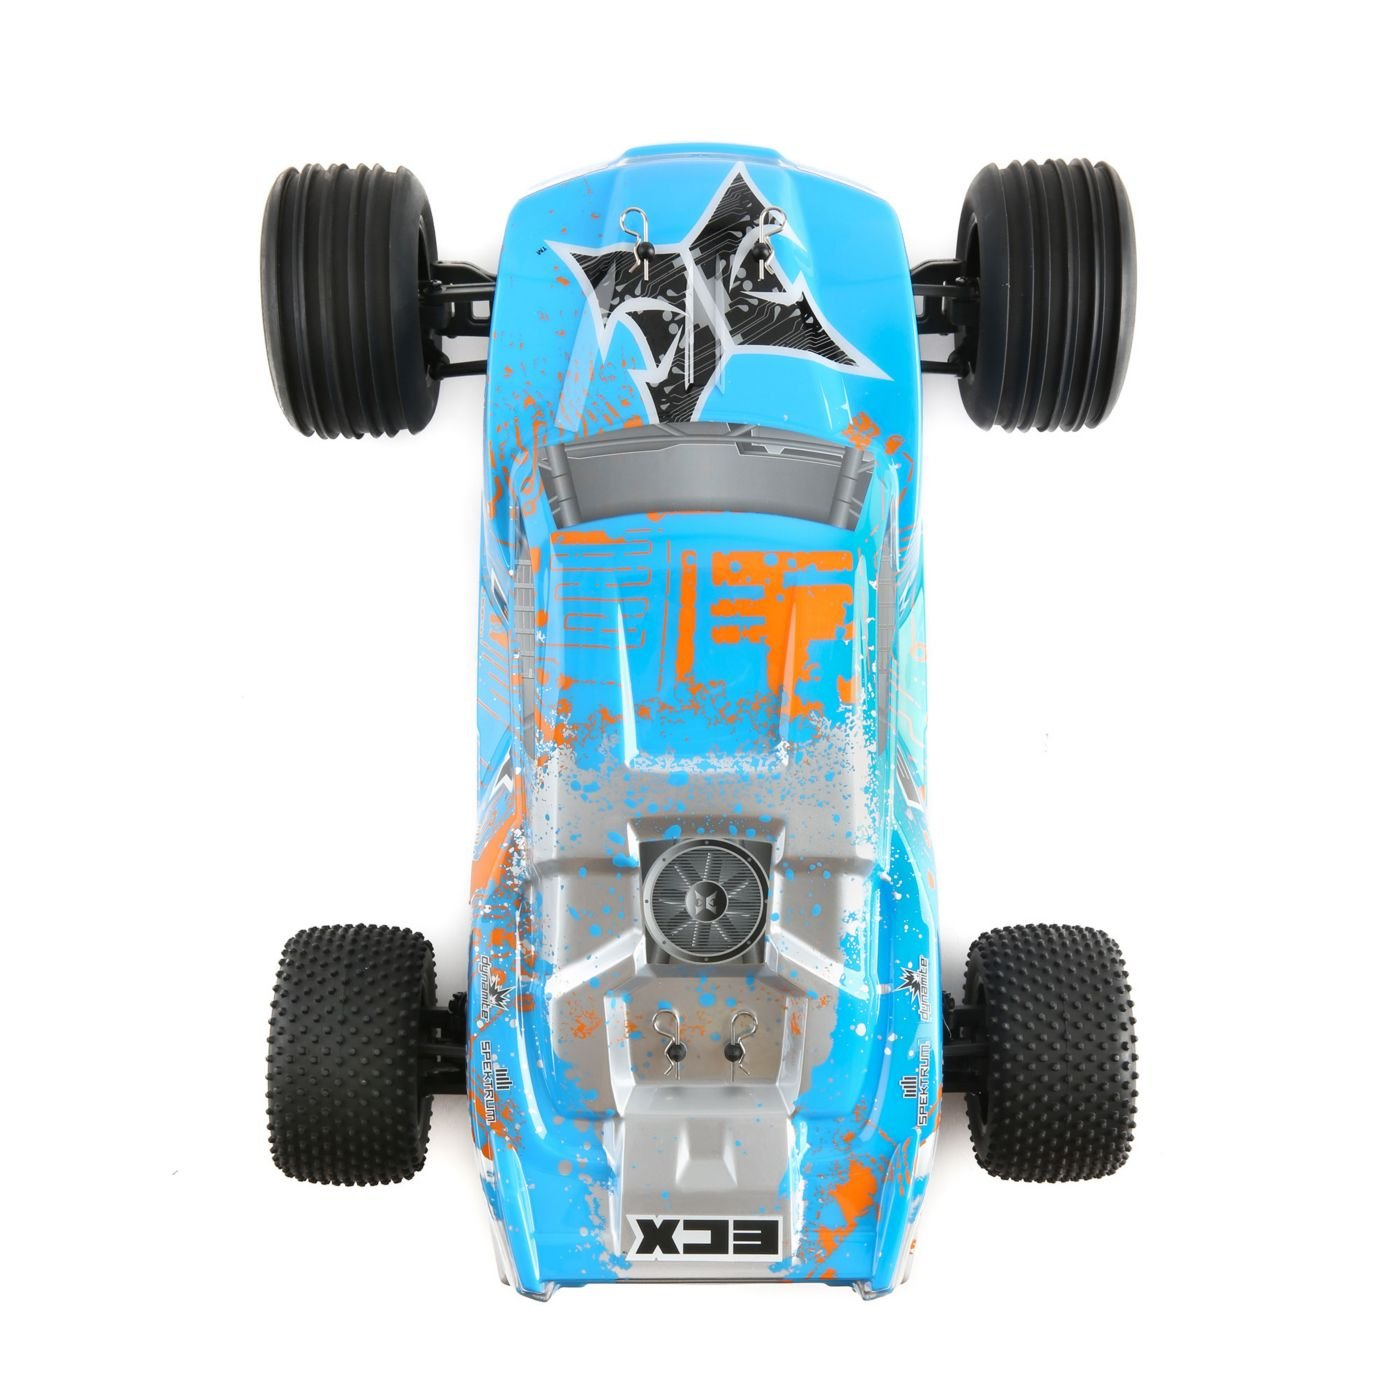 ECX 1/10 2WD Circuit Brushed, LiPo: RTR INT blau/Orange